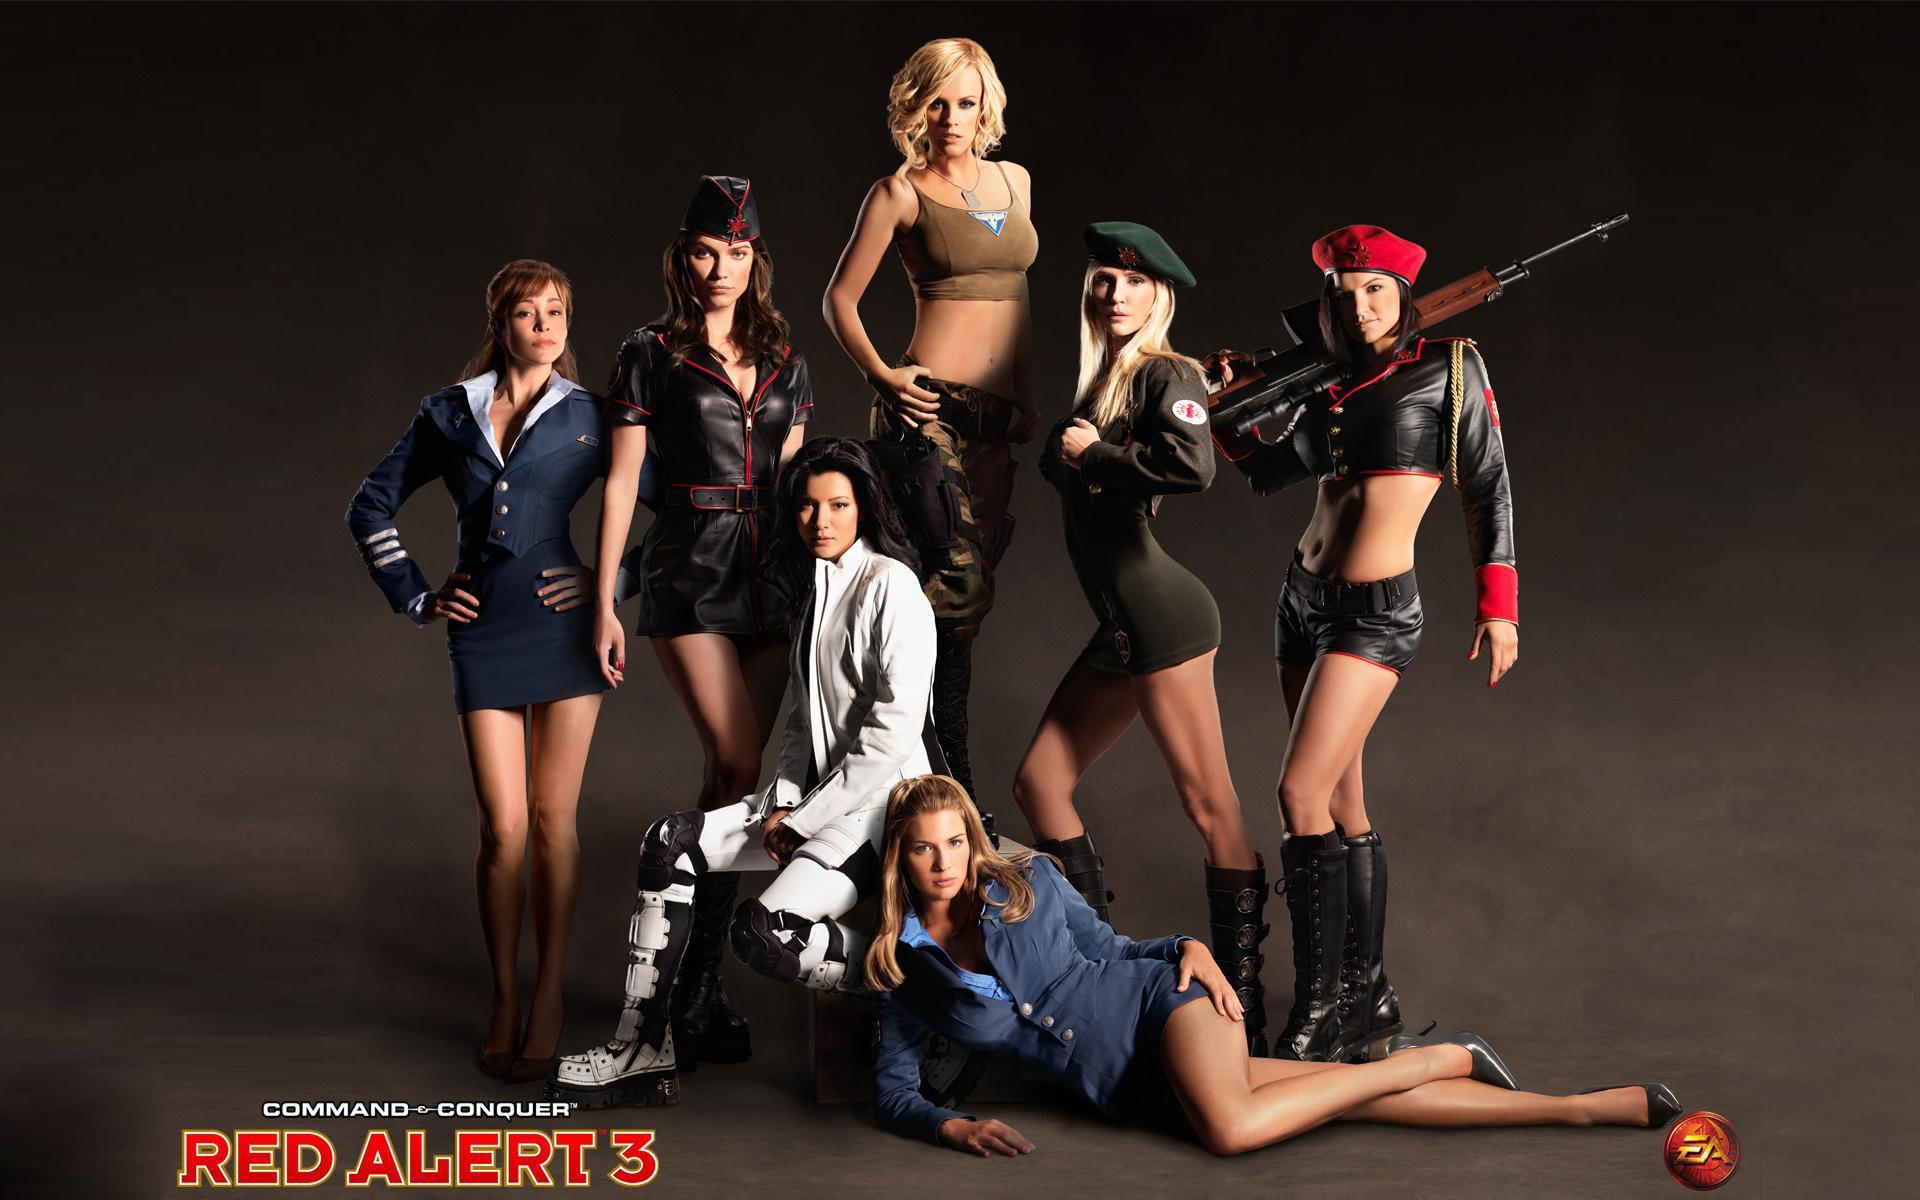 Red-Aler-3-girls-Pozadia-na-plochu